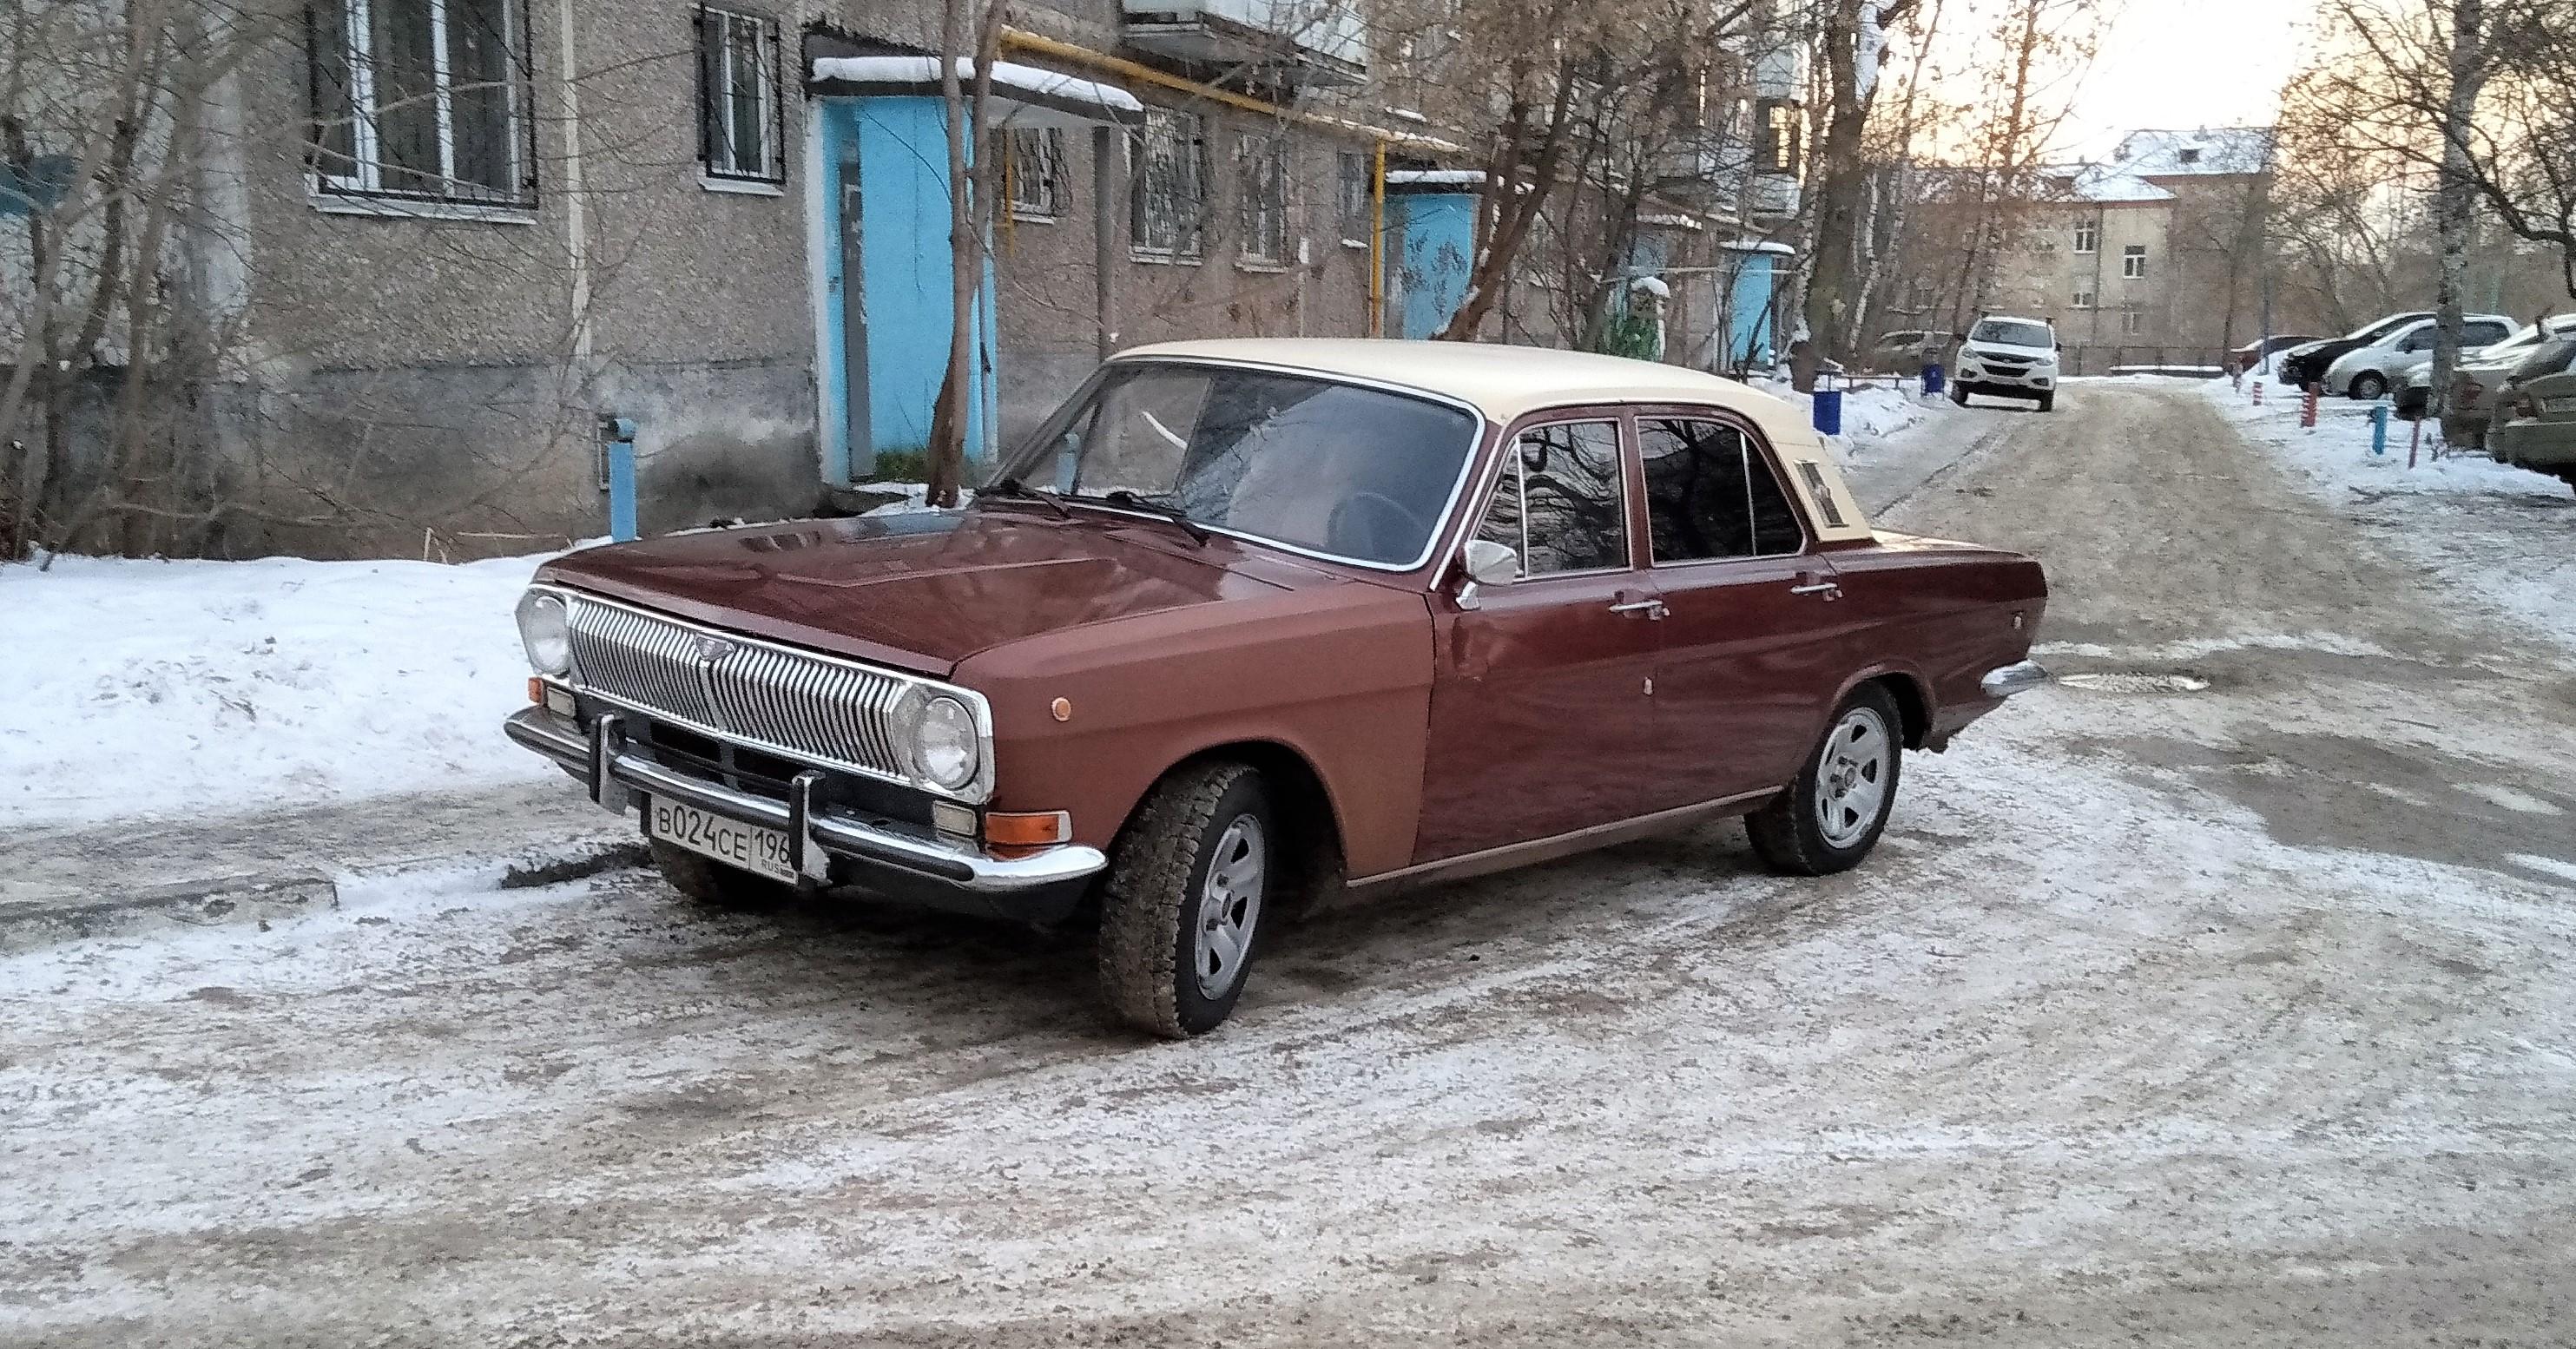 Январь 2019, Екатеринбург. ford